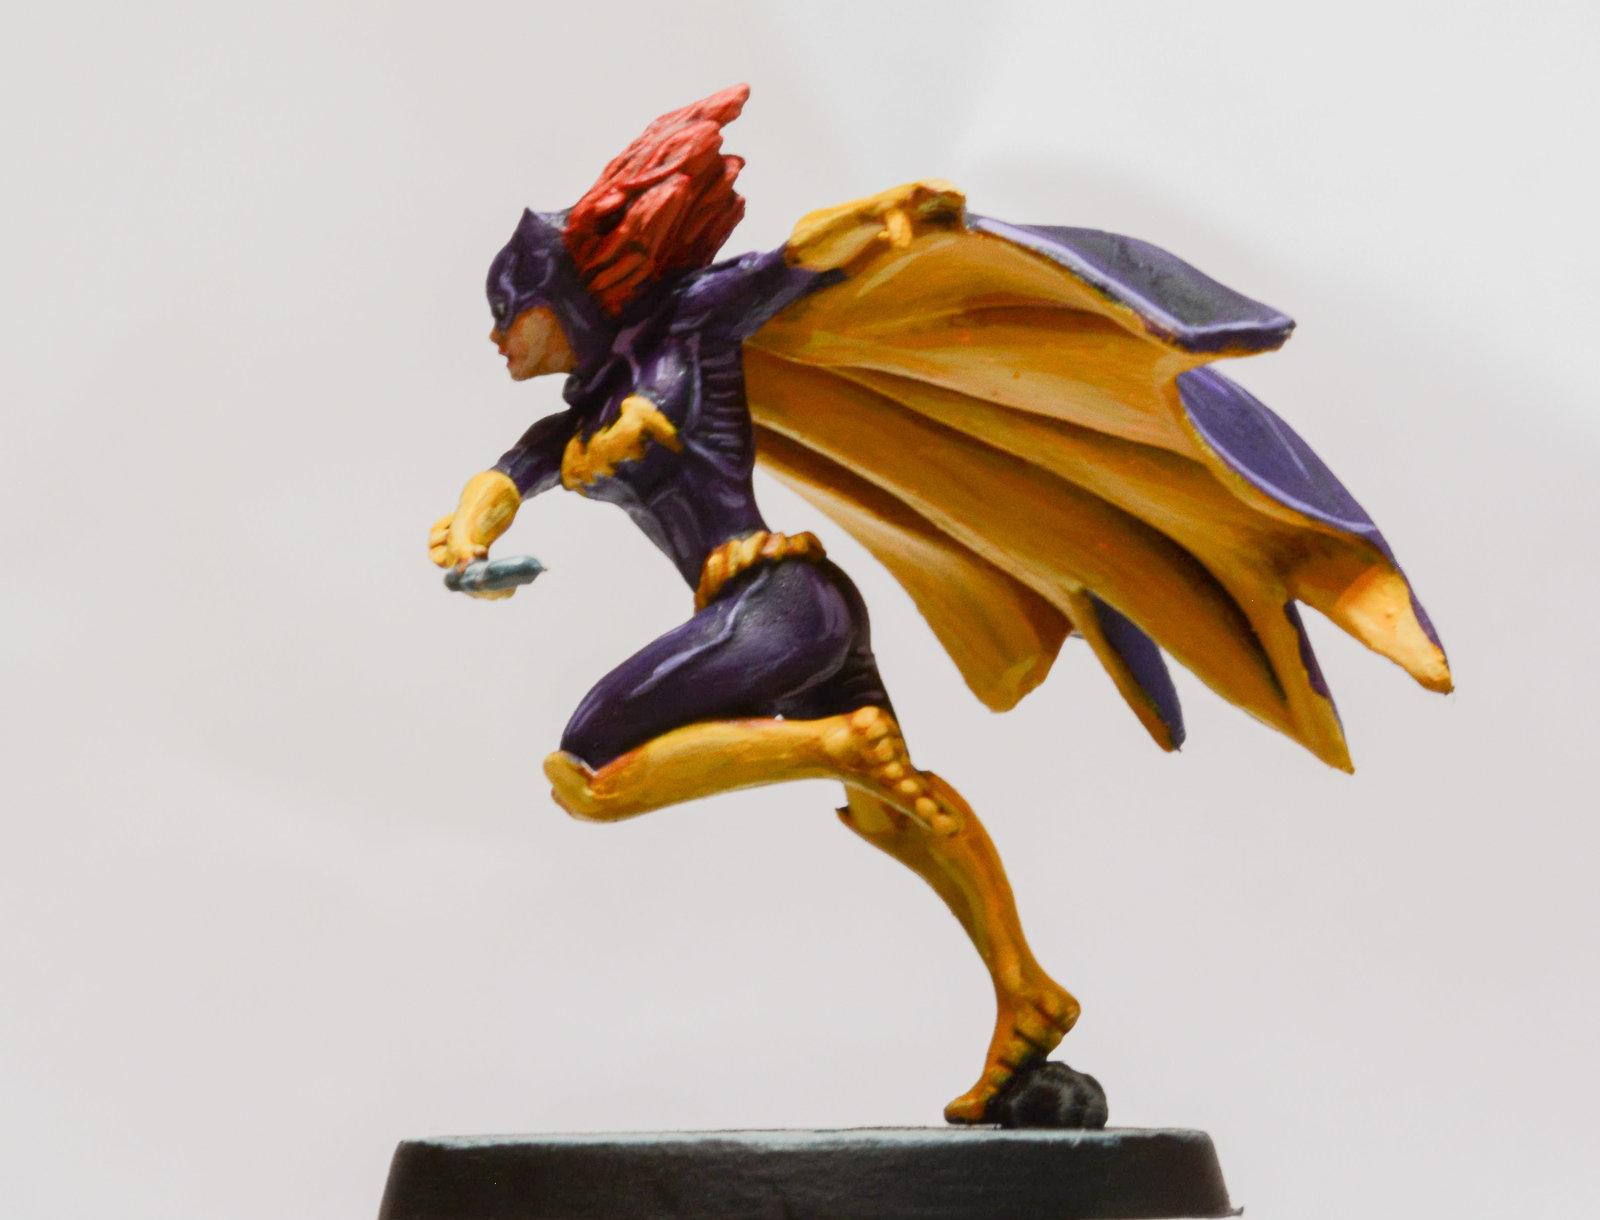 large.batgirl-0189.JPG.0a3ee0c48bfe5f0b26ecec6facfca212.JPG